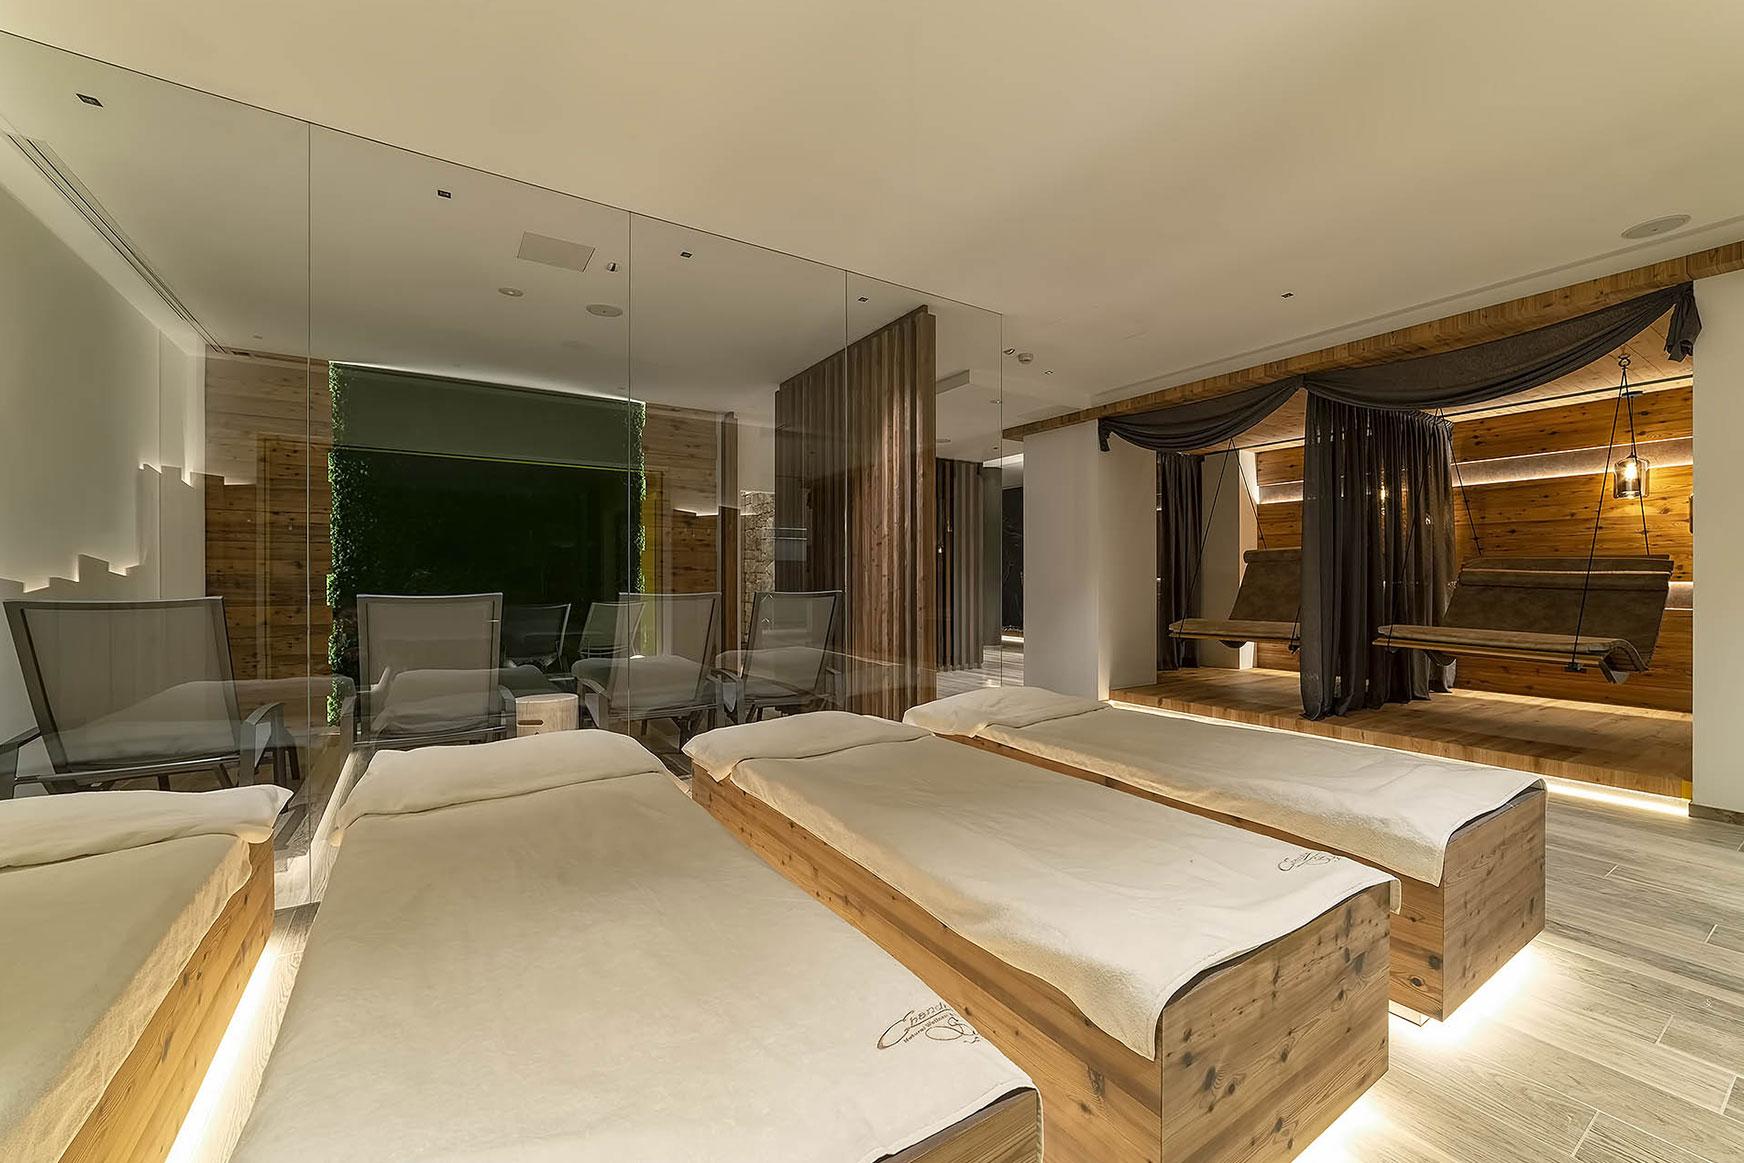 HAY RELAX<br /> HOTEL SHANDRANJ - LOC. STAVA (TN)